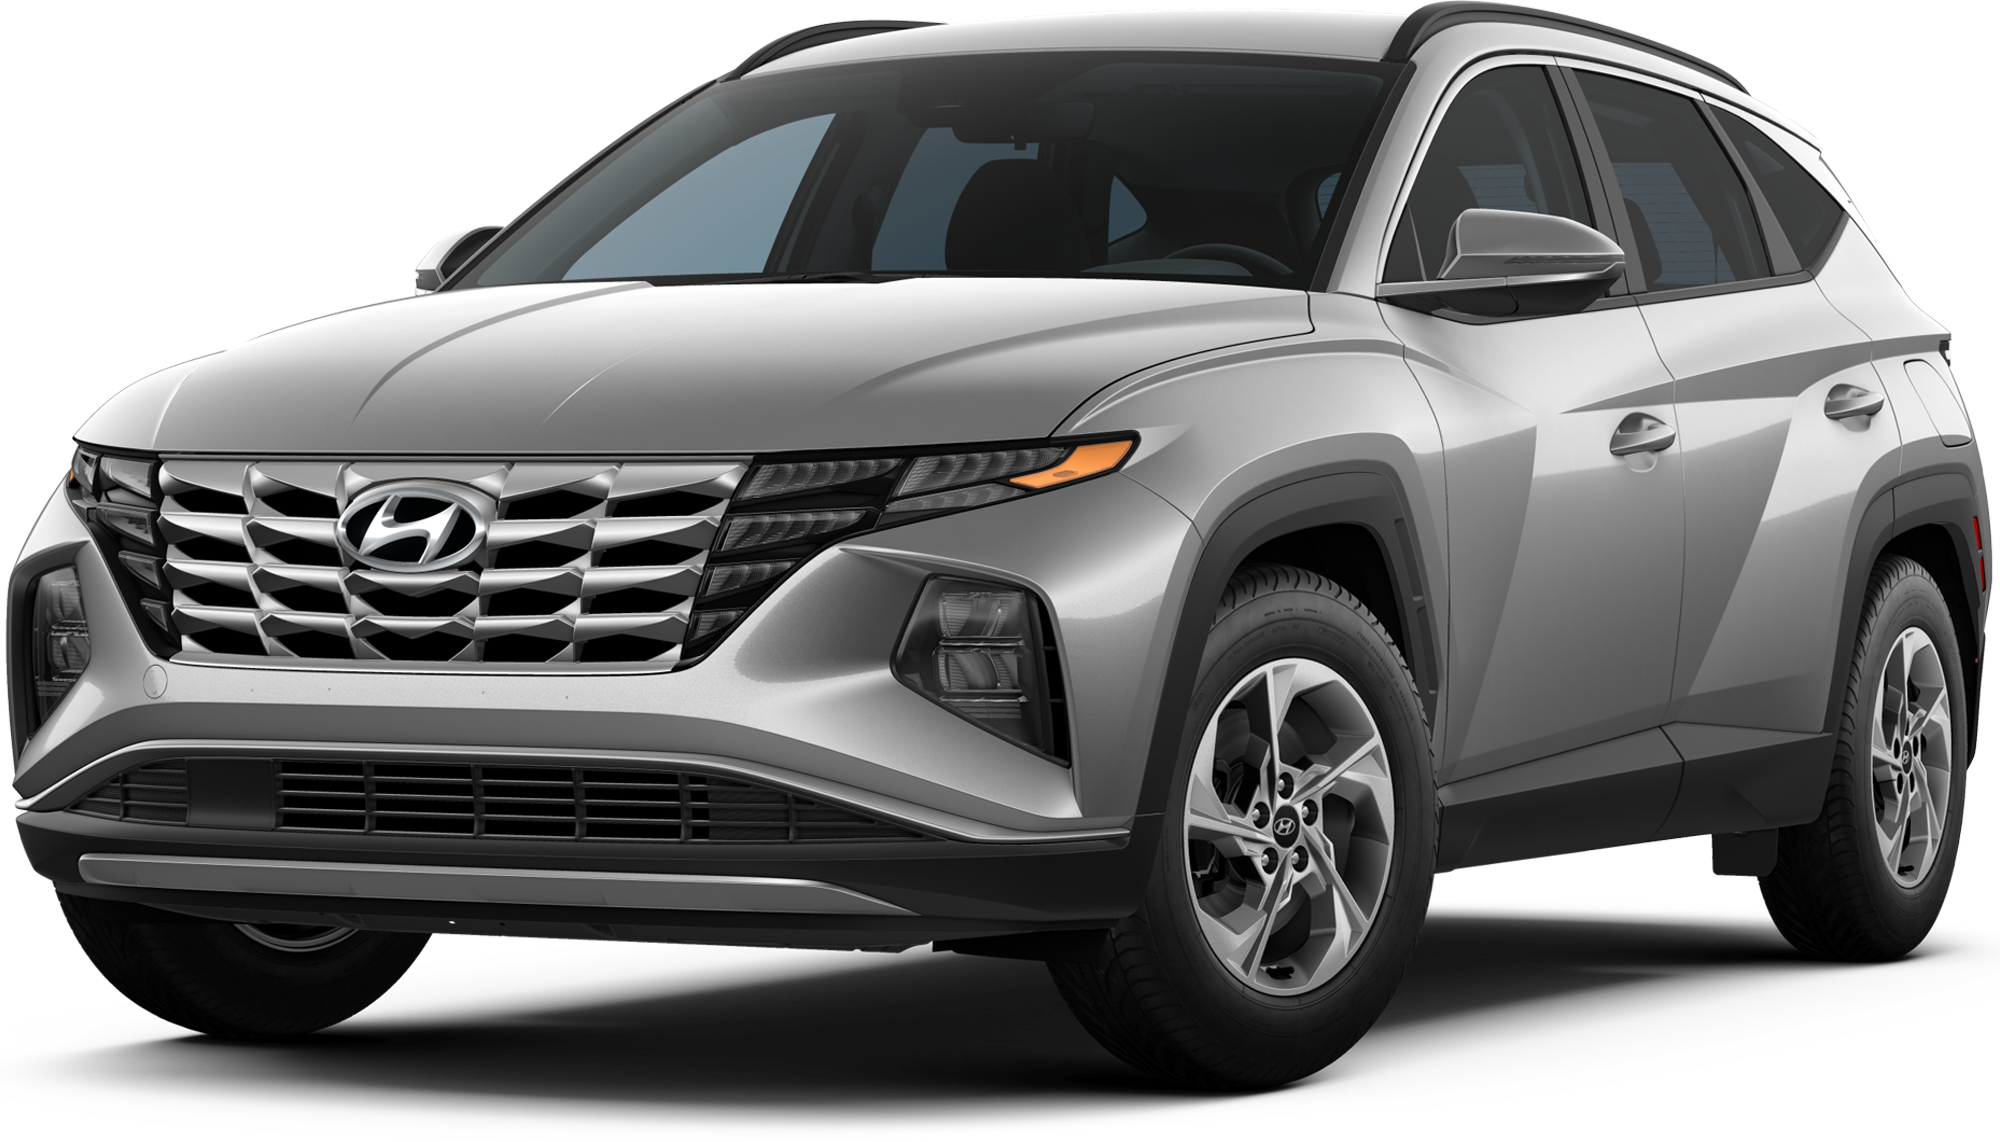 2022 Hyundai Tucson SUV SEL